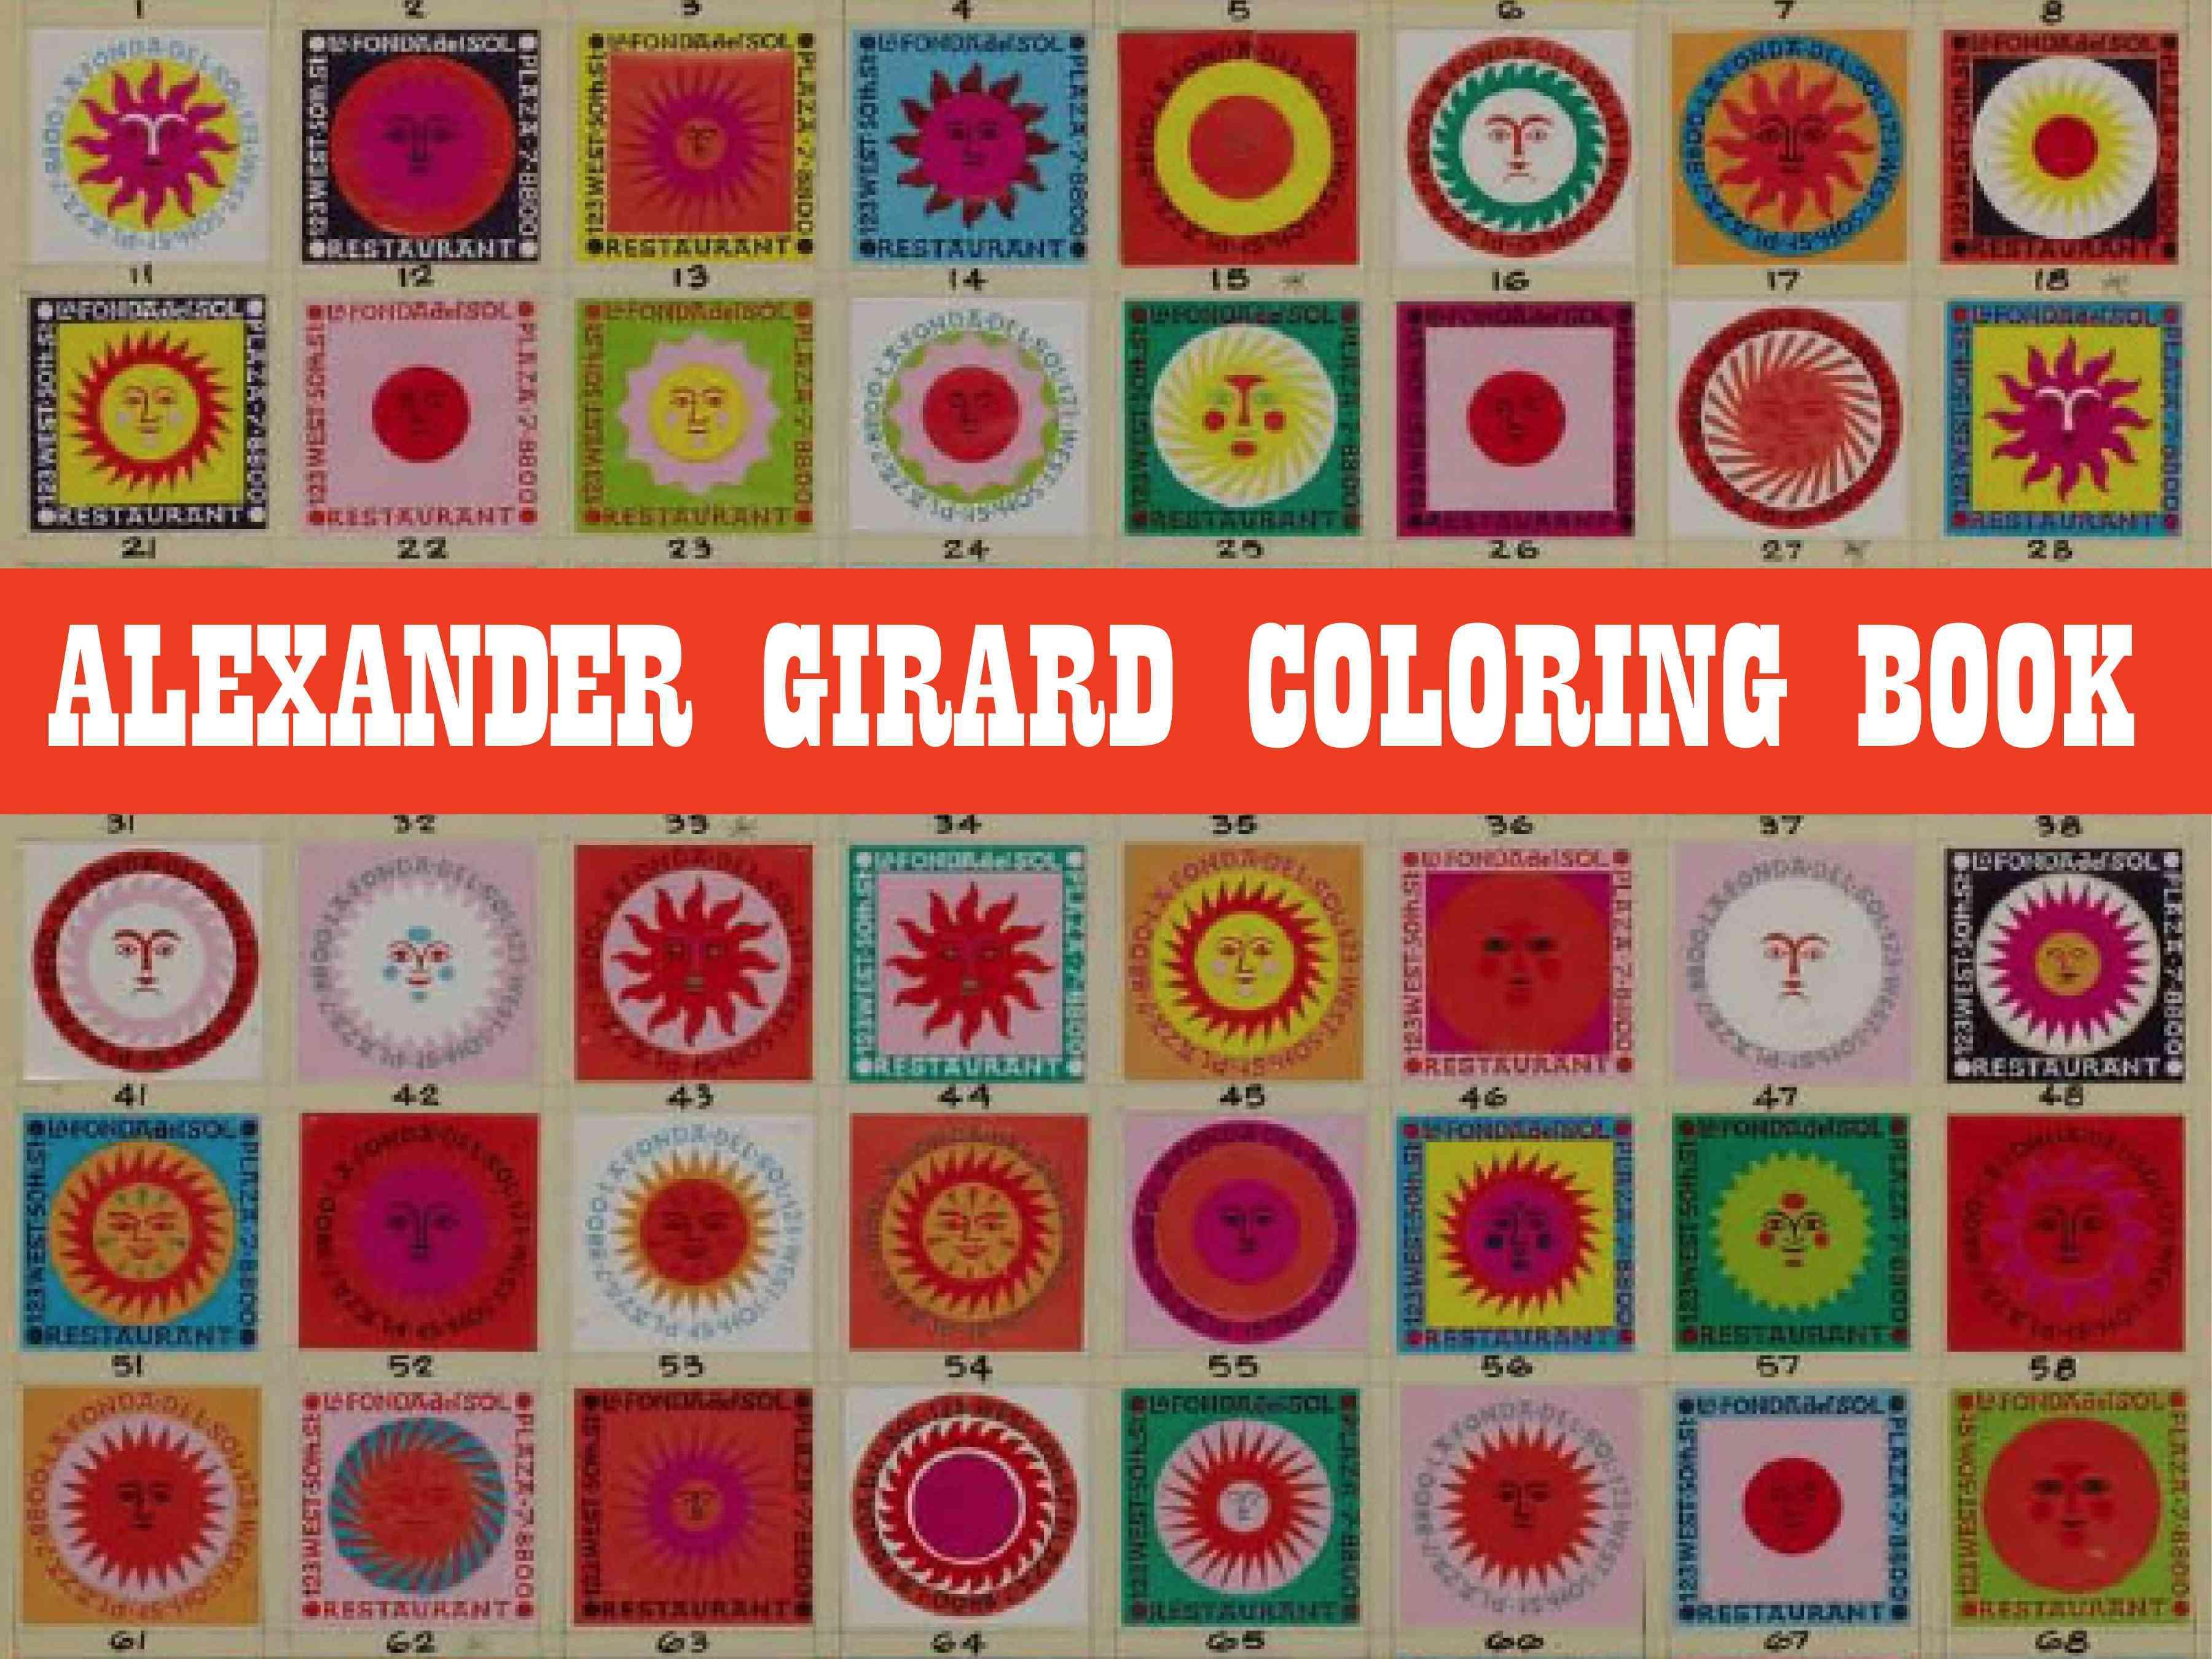 Alexander Girard Coloring Book (Paperback)